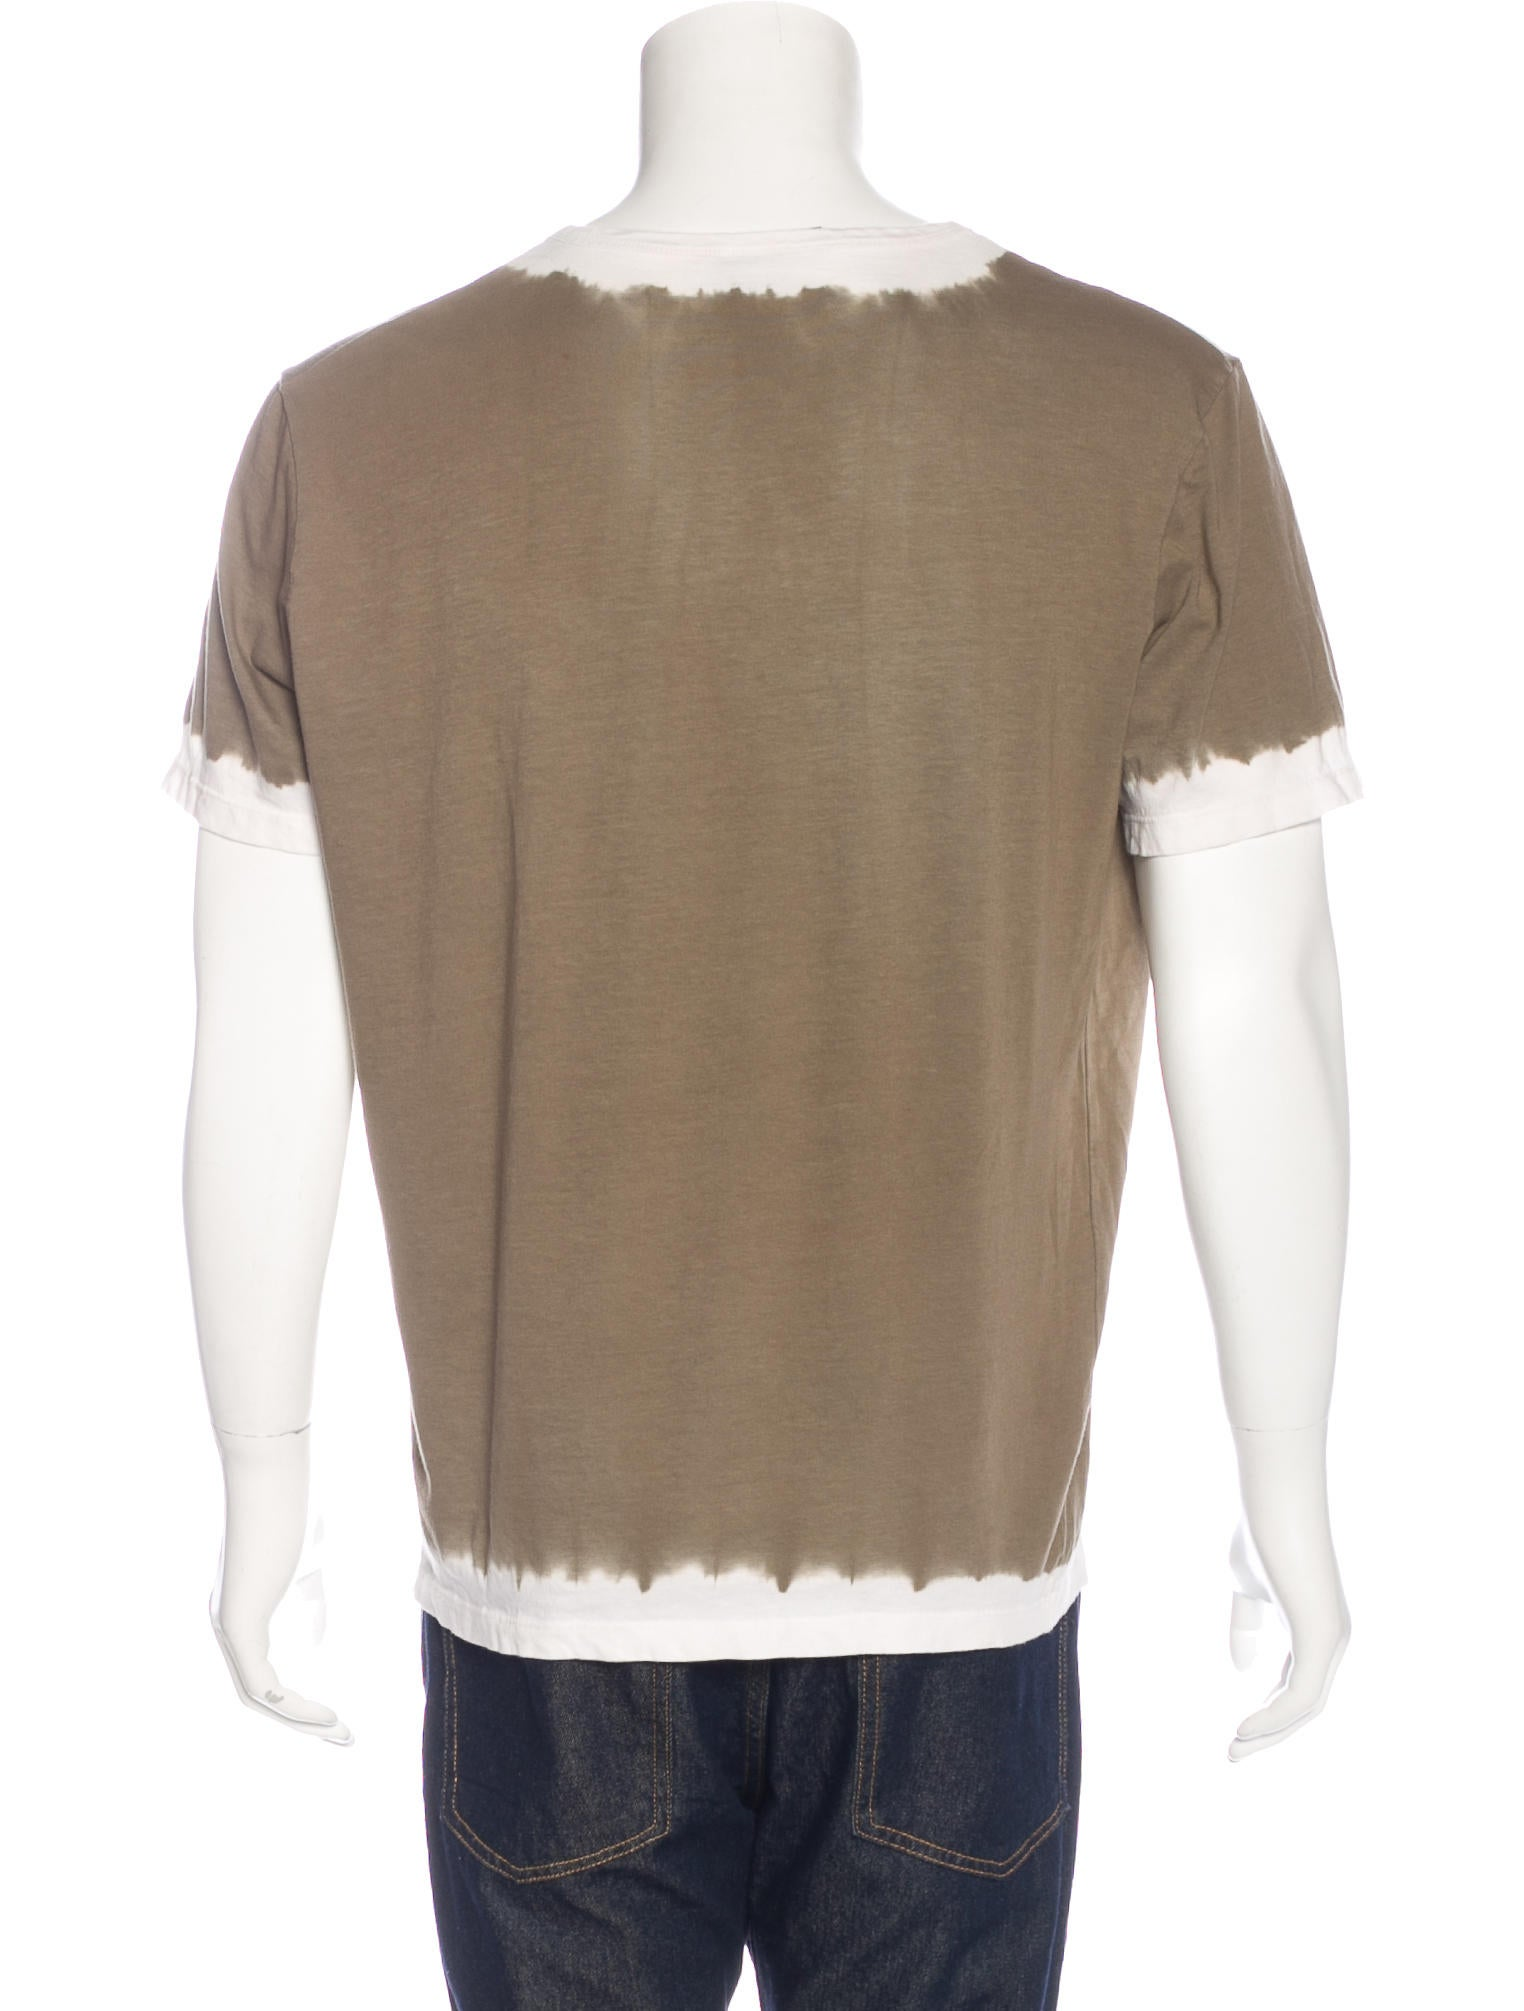 Prada dip dye v neck t shirt clothing pra144910 the for Mens dip dye shirt